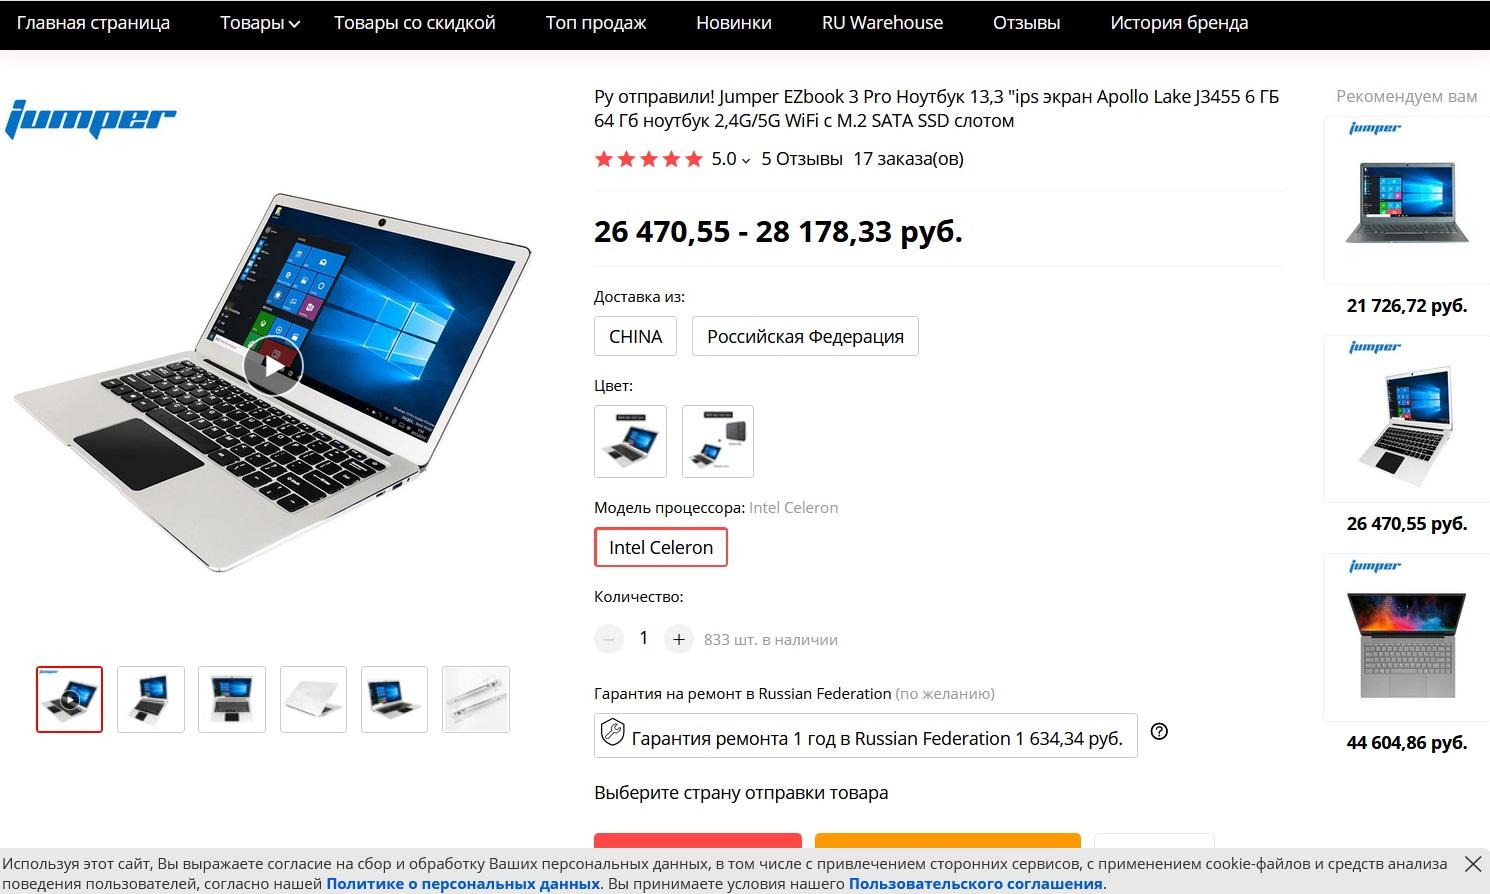 Ноутбук Jumper Ezbook 3